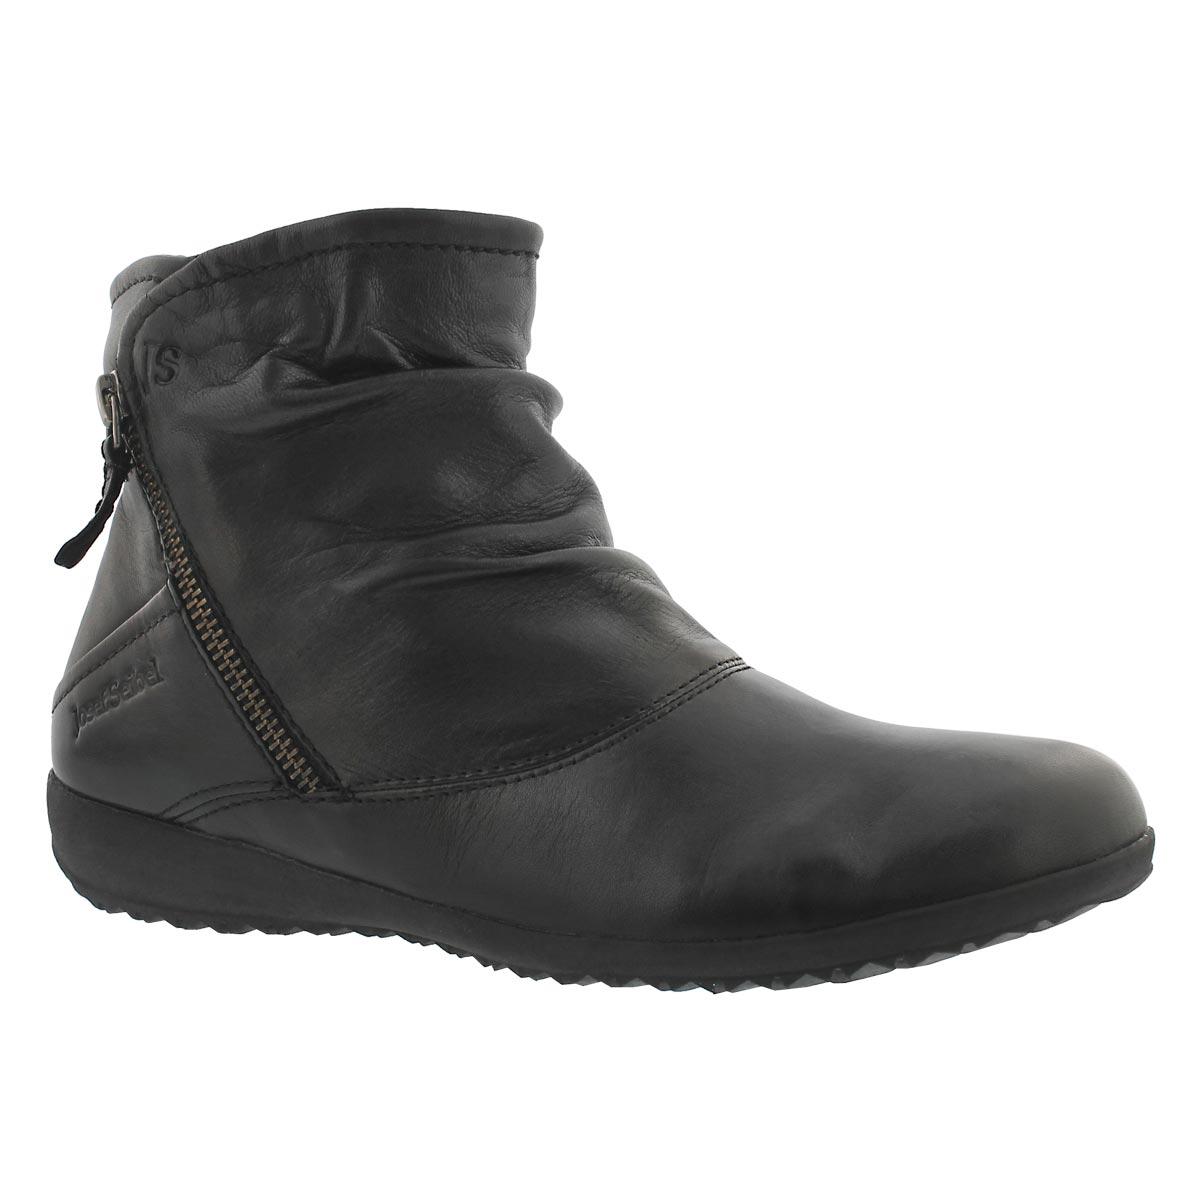 Women's NALY 01 schwarz side zip ankle boots